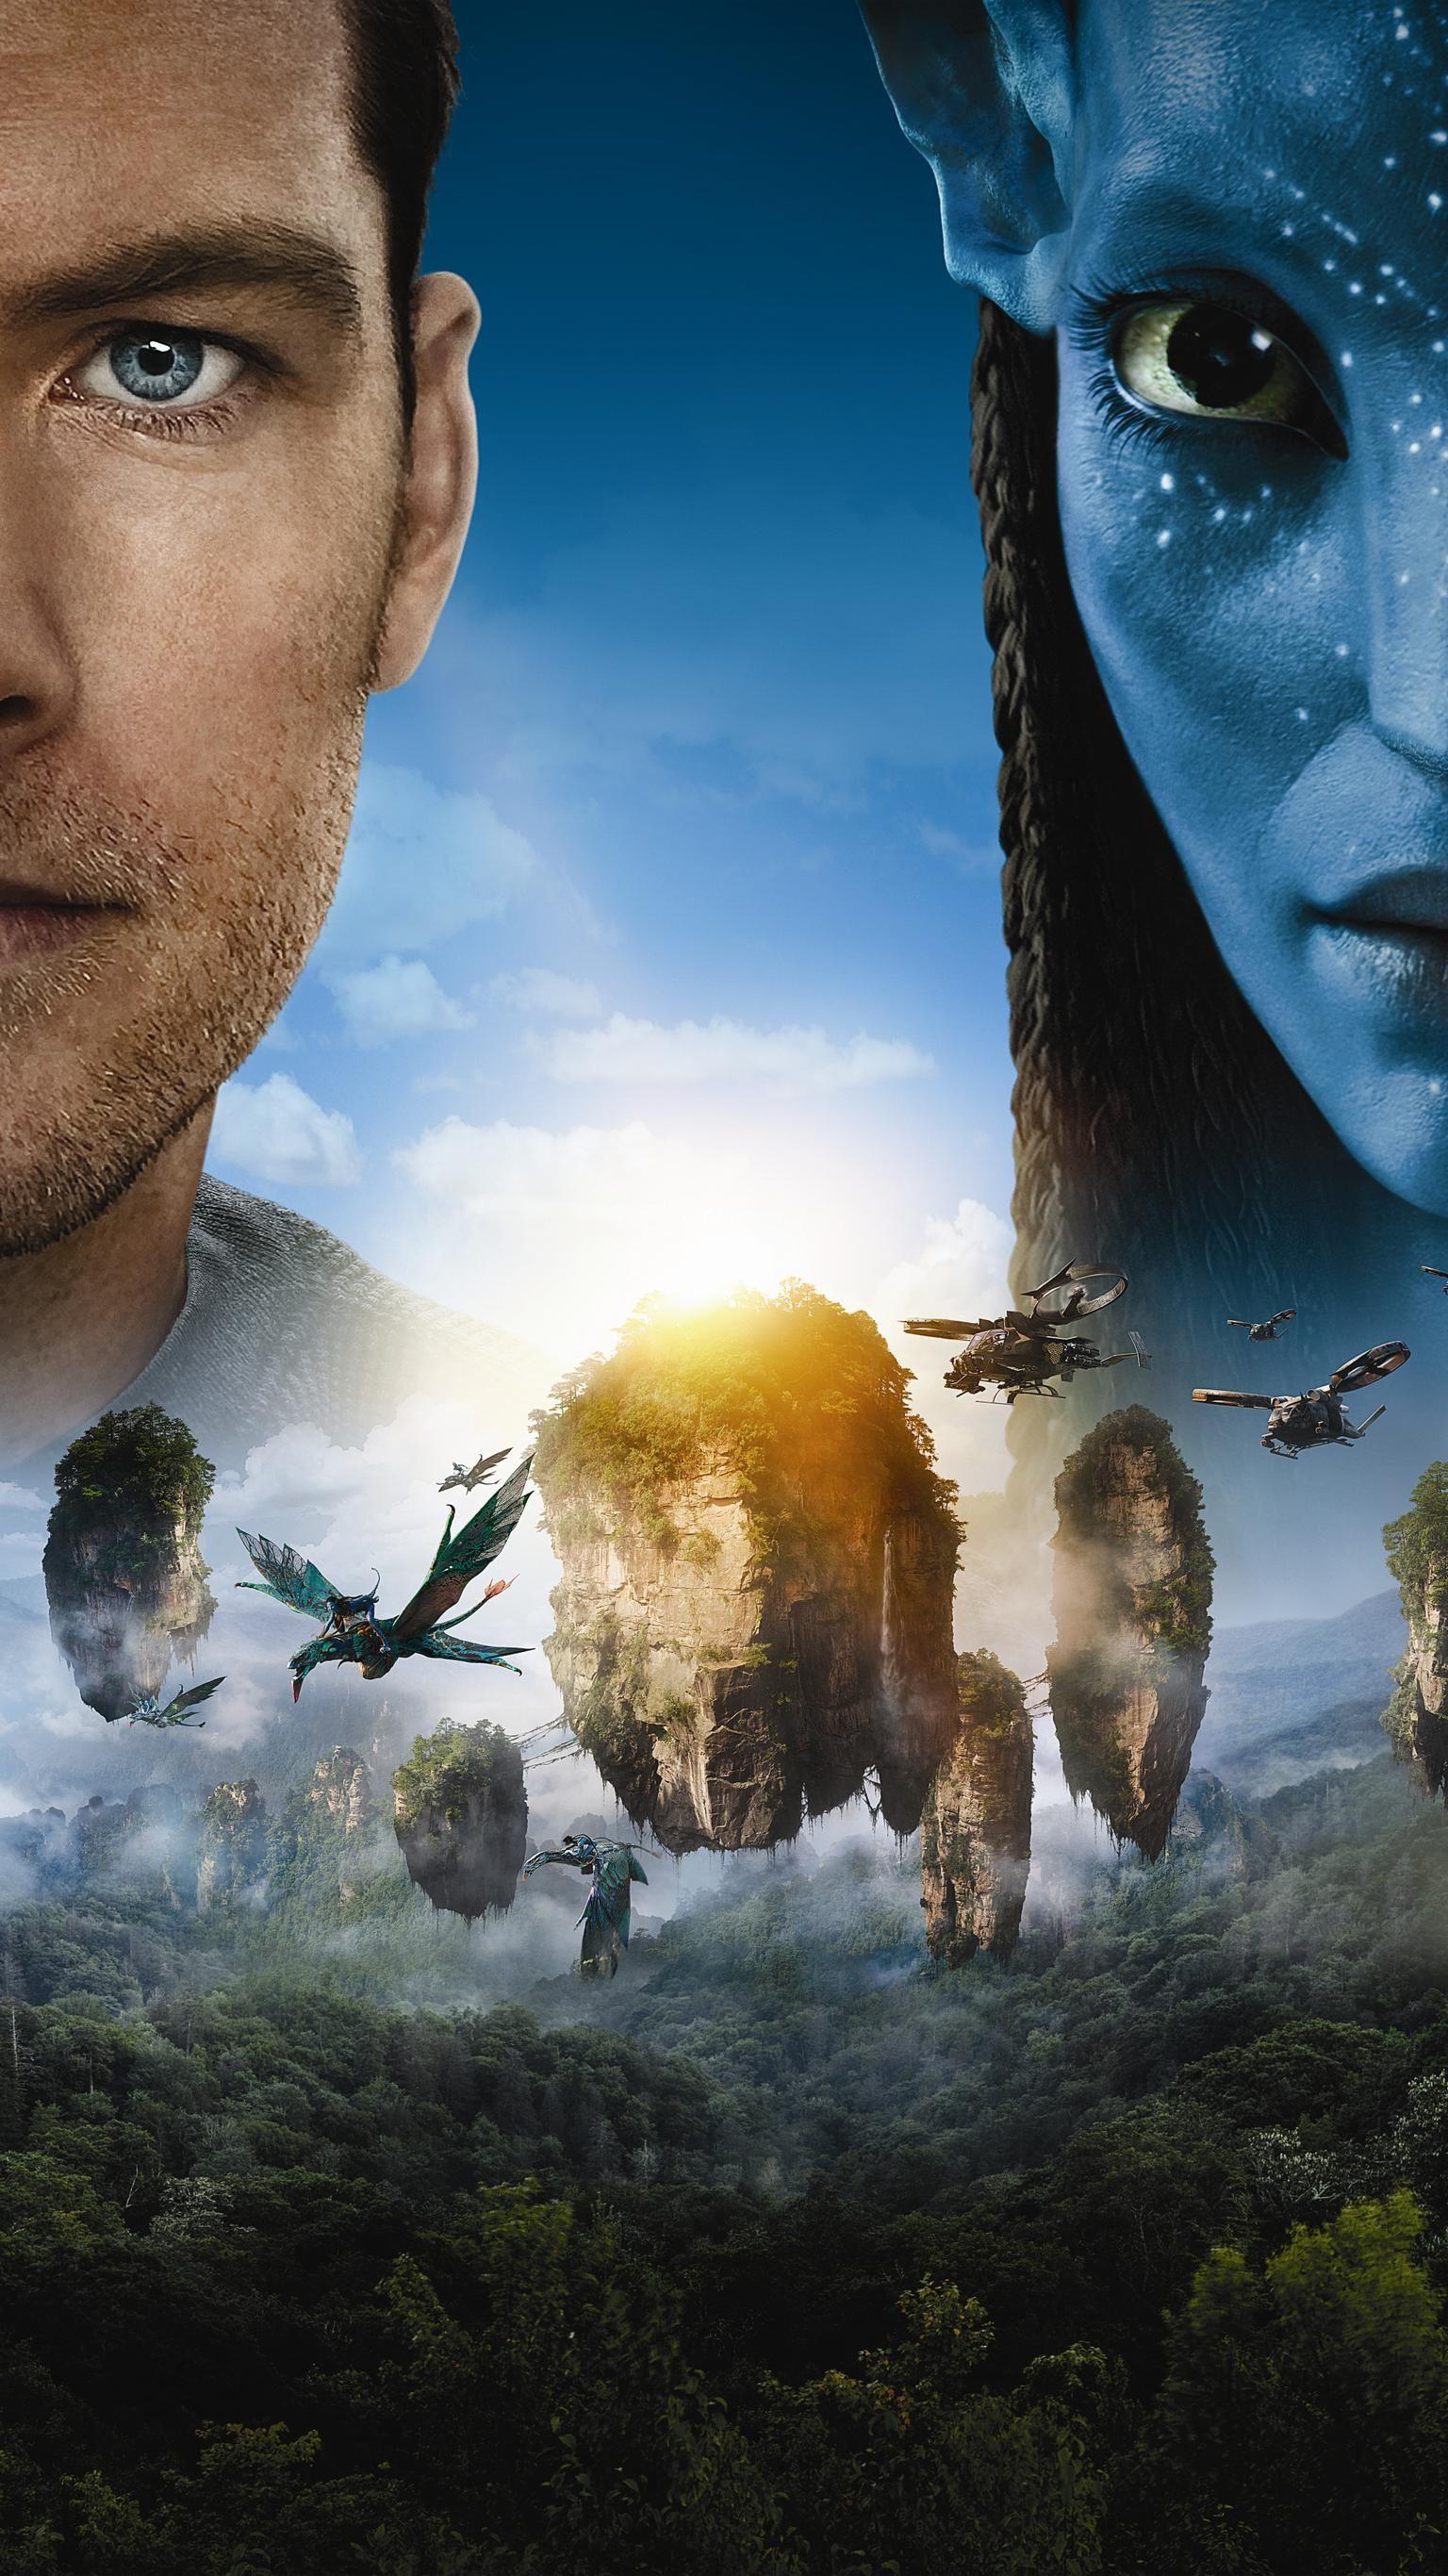 Avatar 2009 Phone Wallpaper Moviemania Avatar Movie Phone Wallpaper Avatar